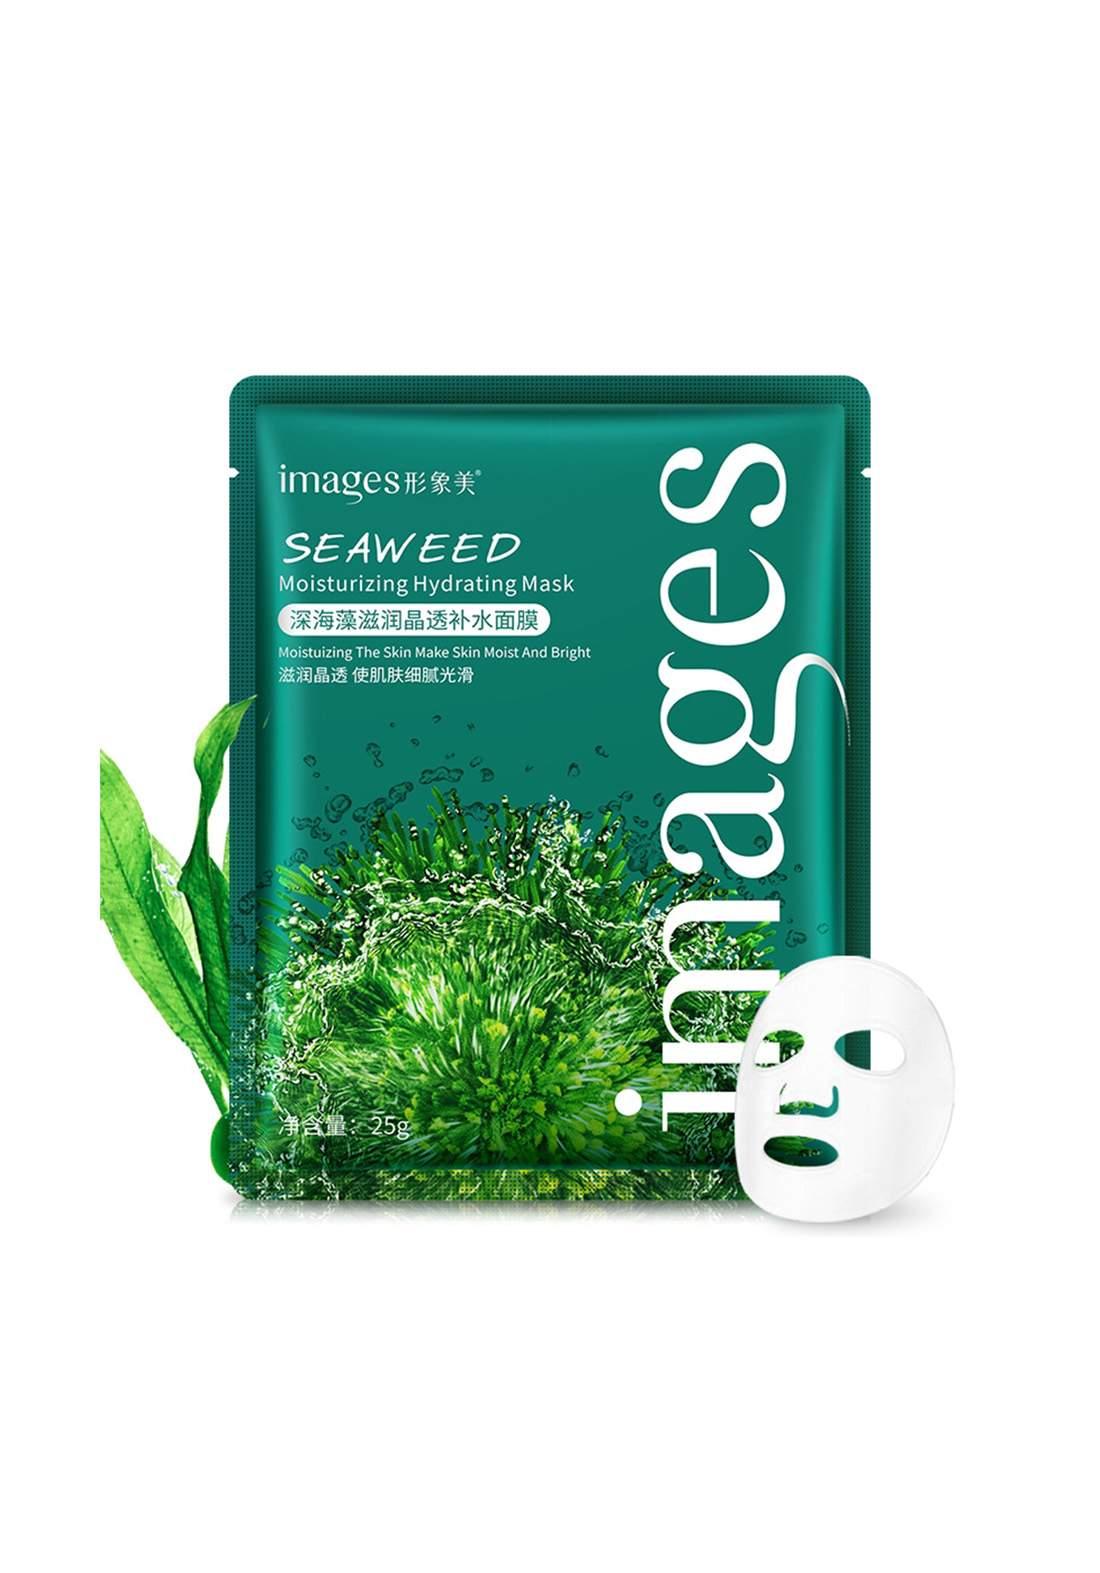 Horec Seaweed Hydrating Mask Smooth Moist  قناع للوجه